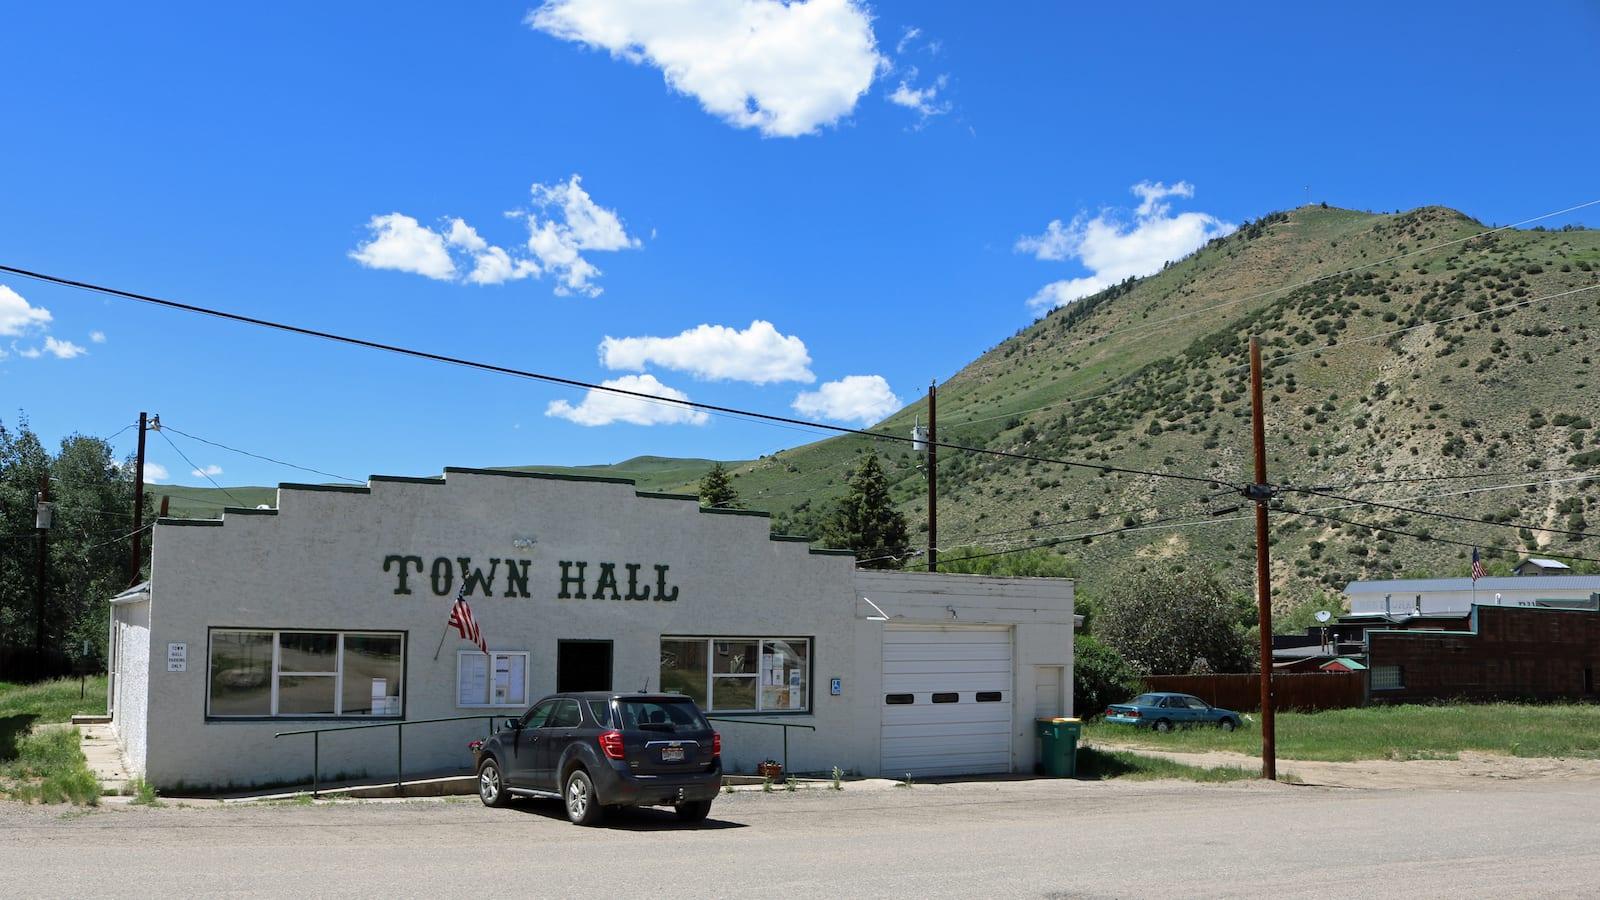 Hot Sulphur Springs Town Hall Colorado